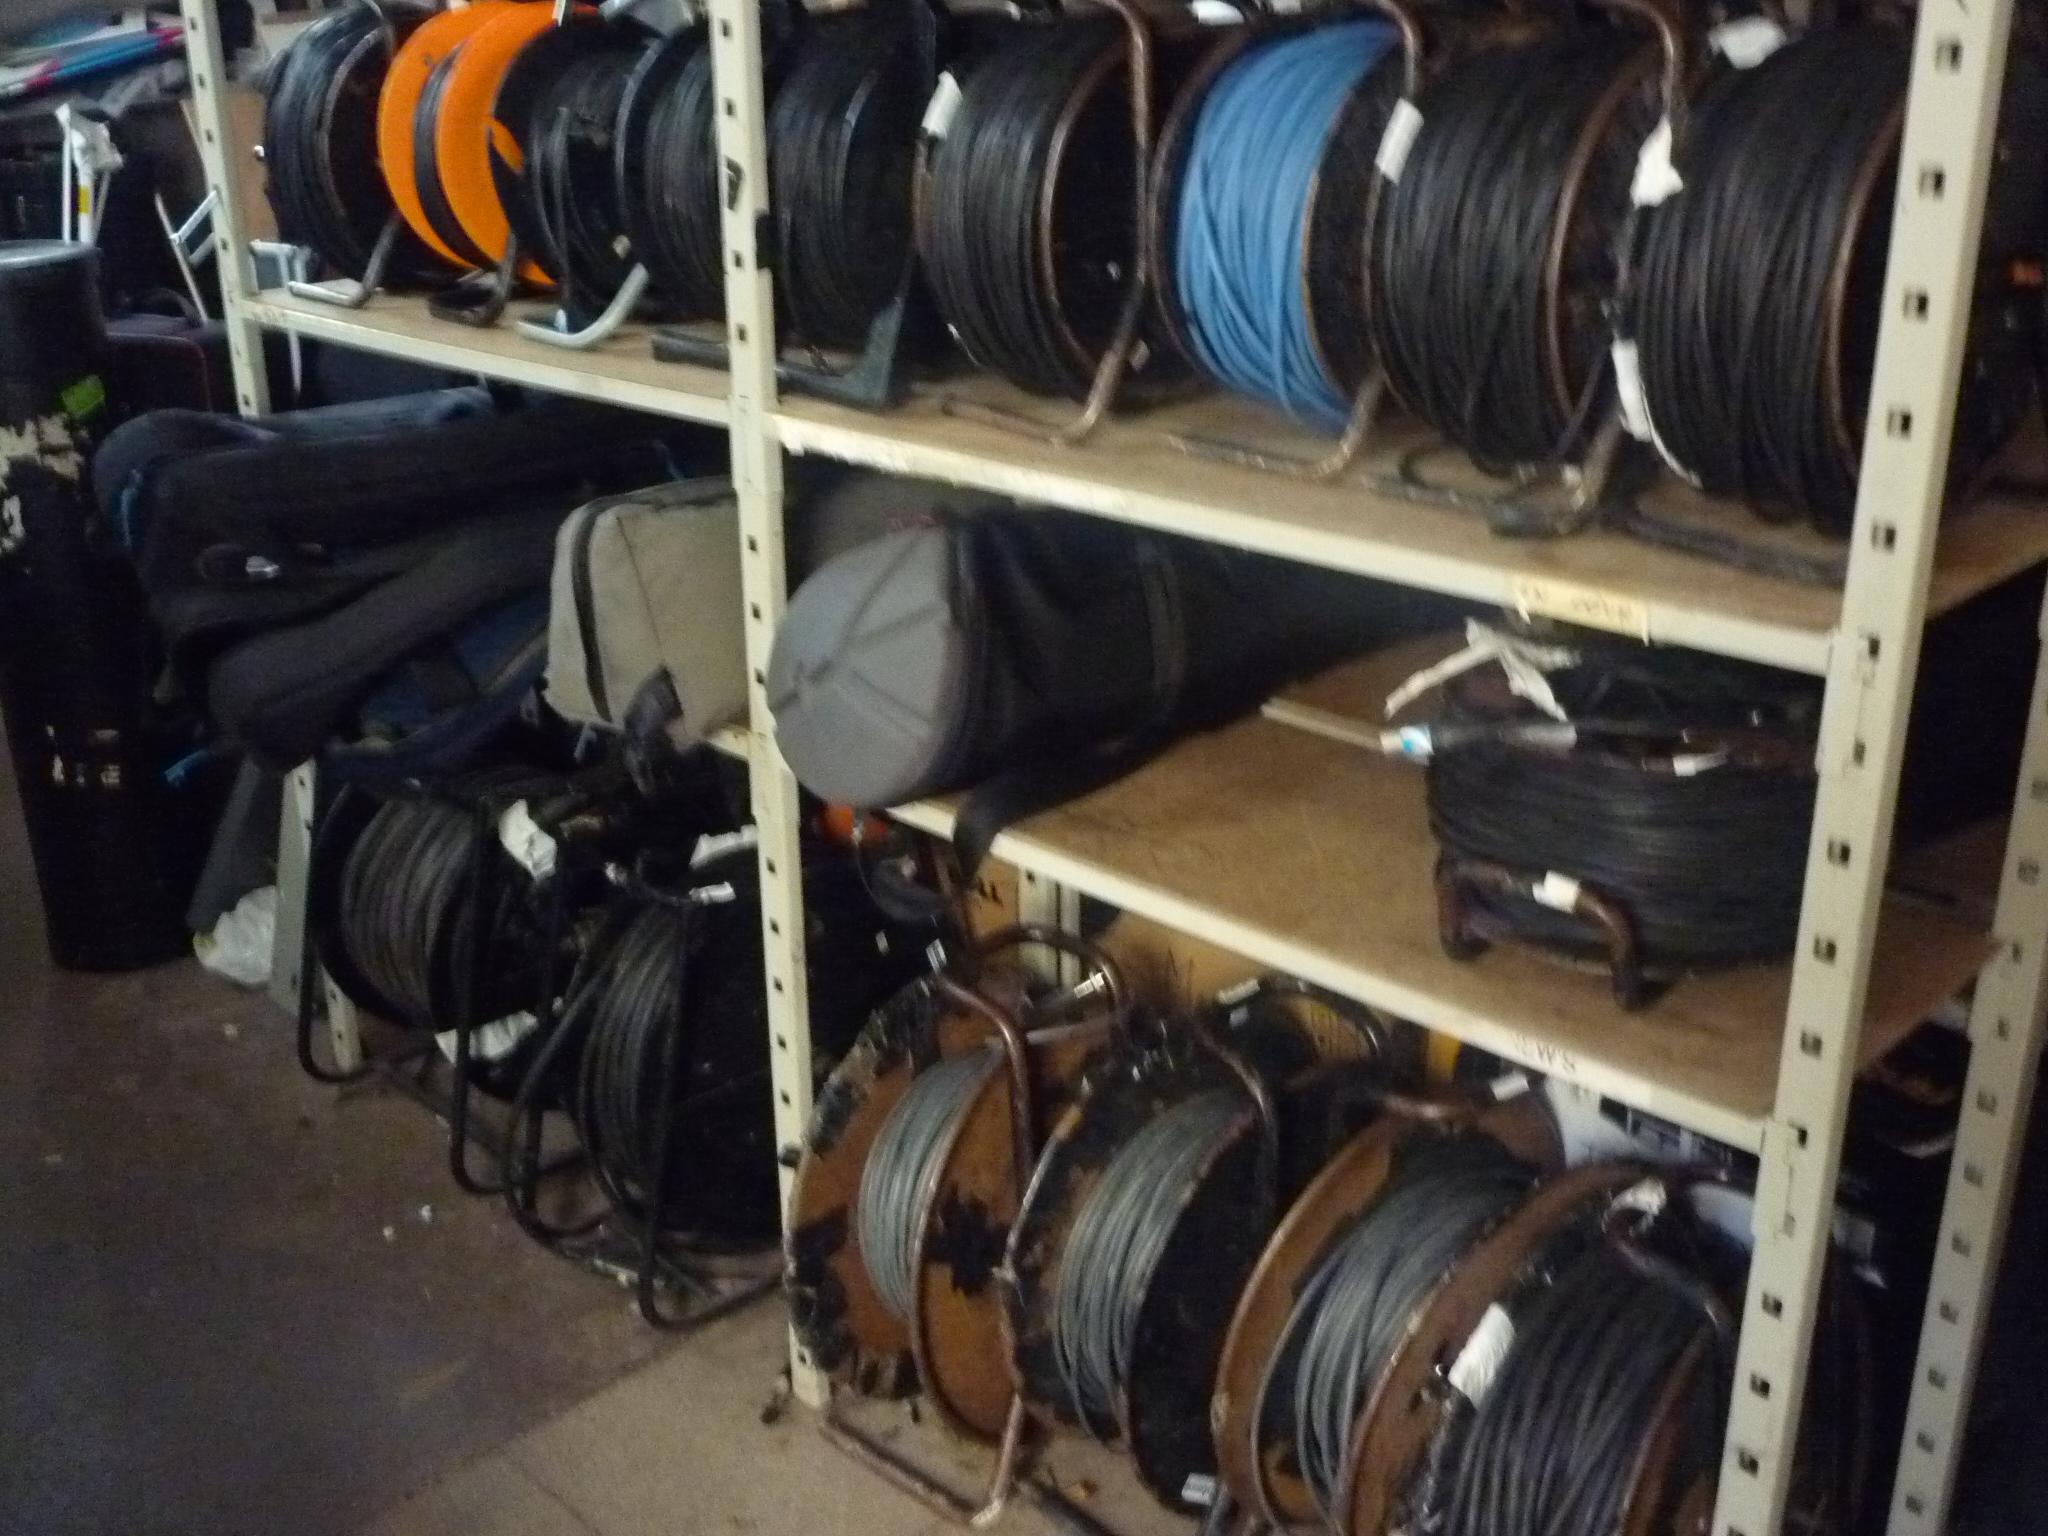 Des câbles, des câbles, des câbles !